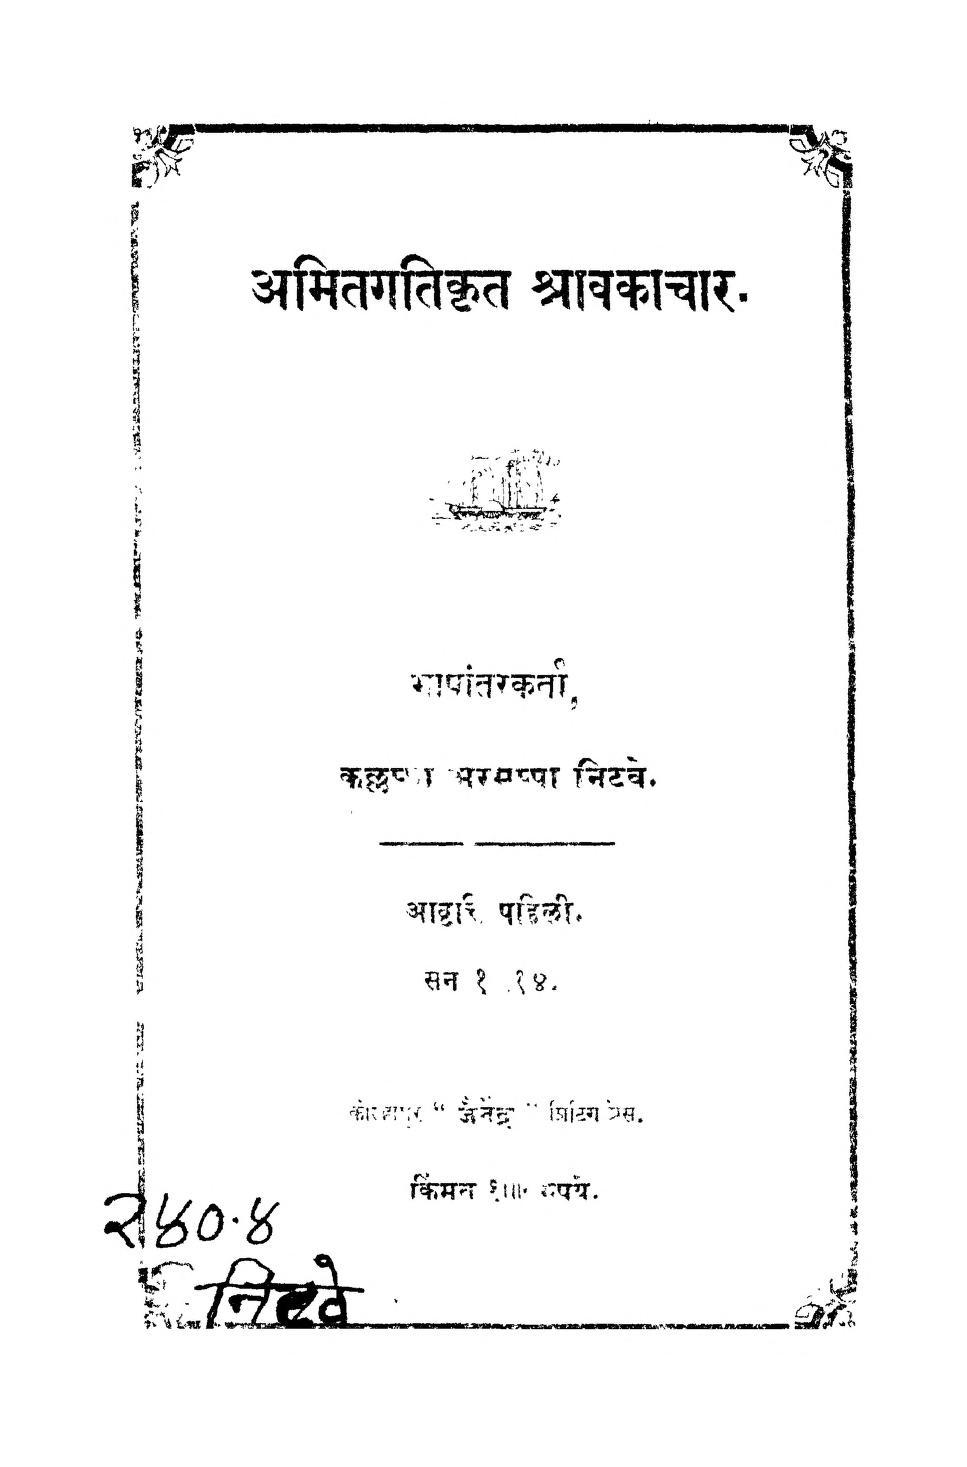 Book Image : अमितगतिकृत श्रावकाचार - Amitgatikrit Shrawkachar